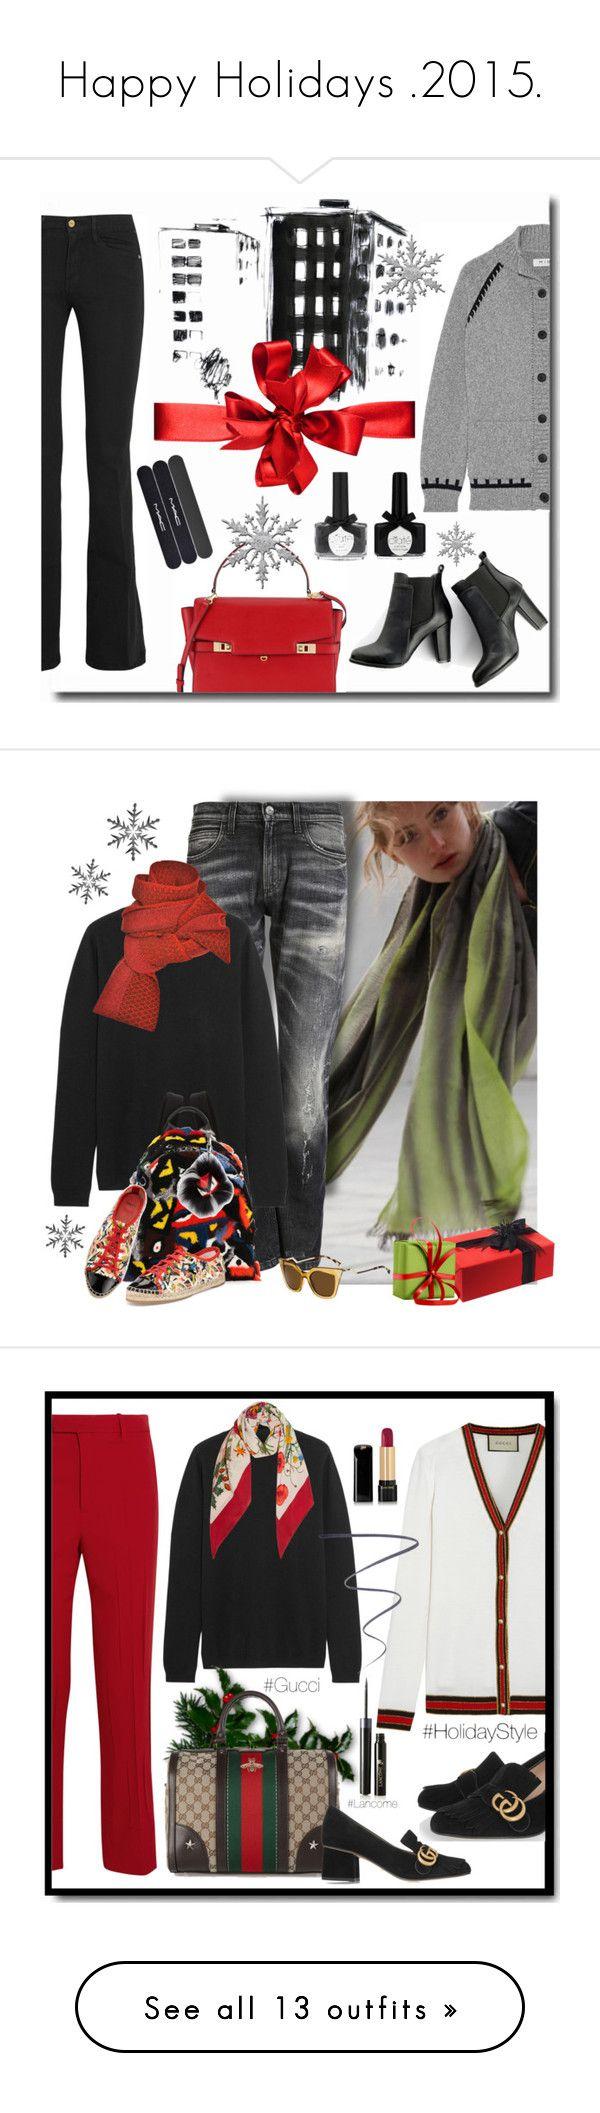 """Happy Holidays .2015."" by jacque-reid ❤ liked on Polyvore featuring Frame Denim, MiH Jeans, Henri Bendel, Burfitt, SWEET MANGO, Ciaté, nordstrom, netaporter, henribendel and Gucci"